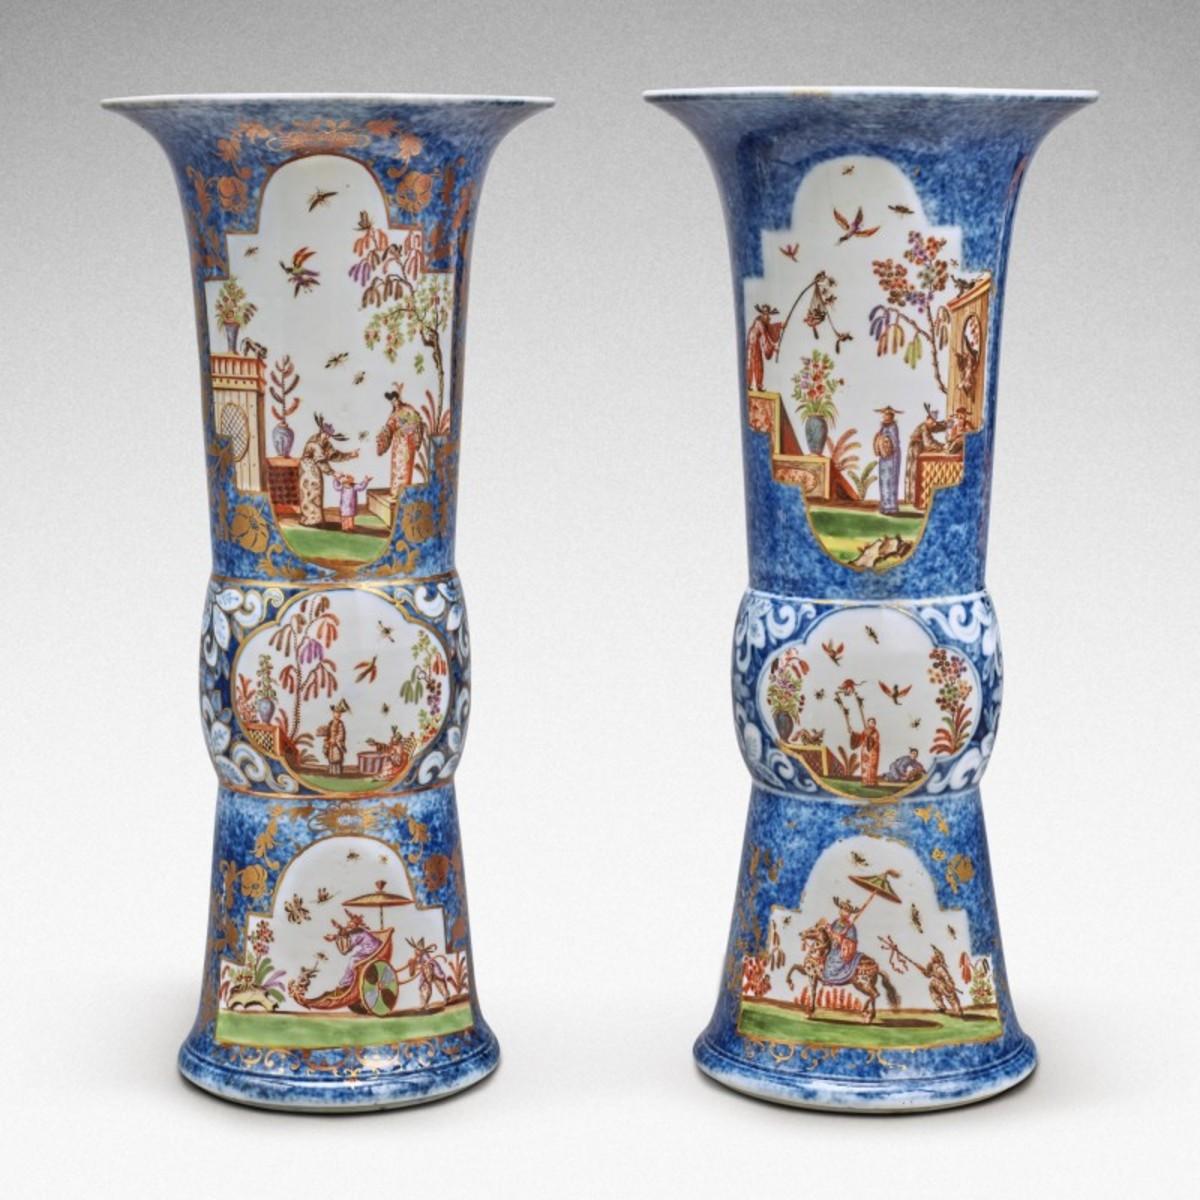 An extremely rare pair of Meissen Augustus Rex underglaze-blue-ground beaker vases, circa 1725, sold for $1.2 million; estimate was $80,000-$120,000.